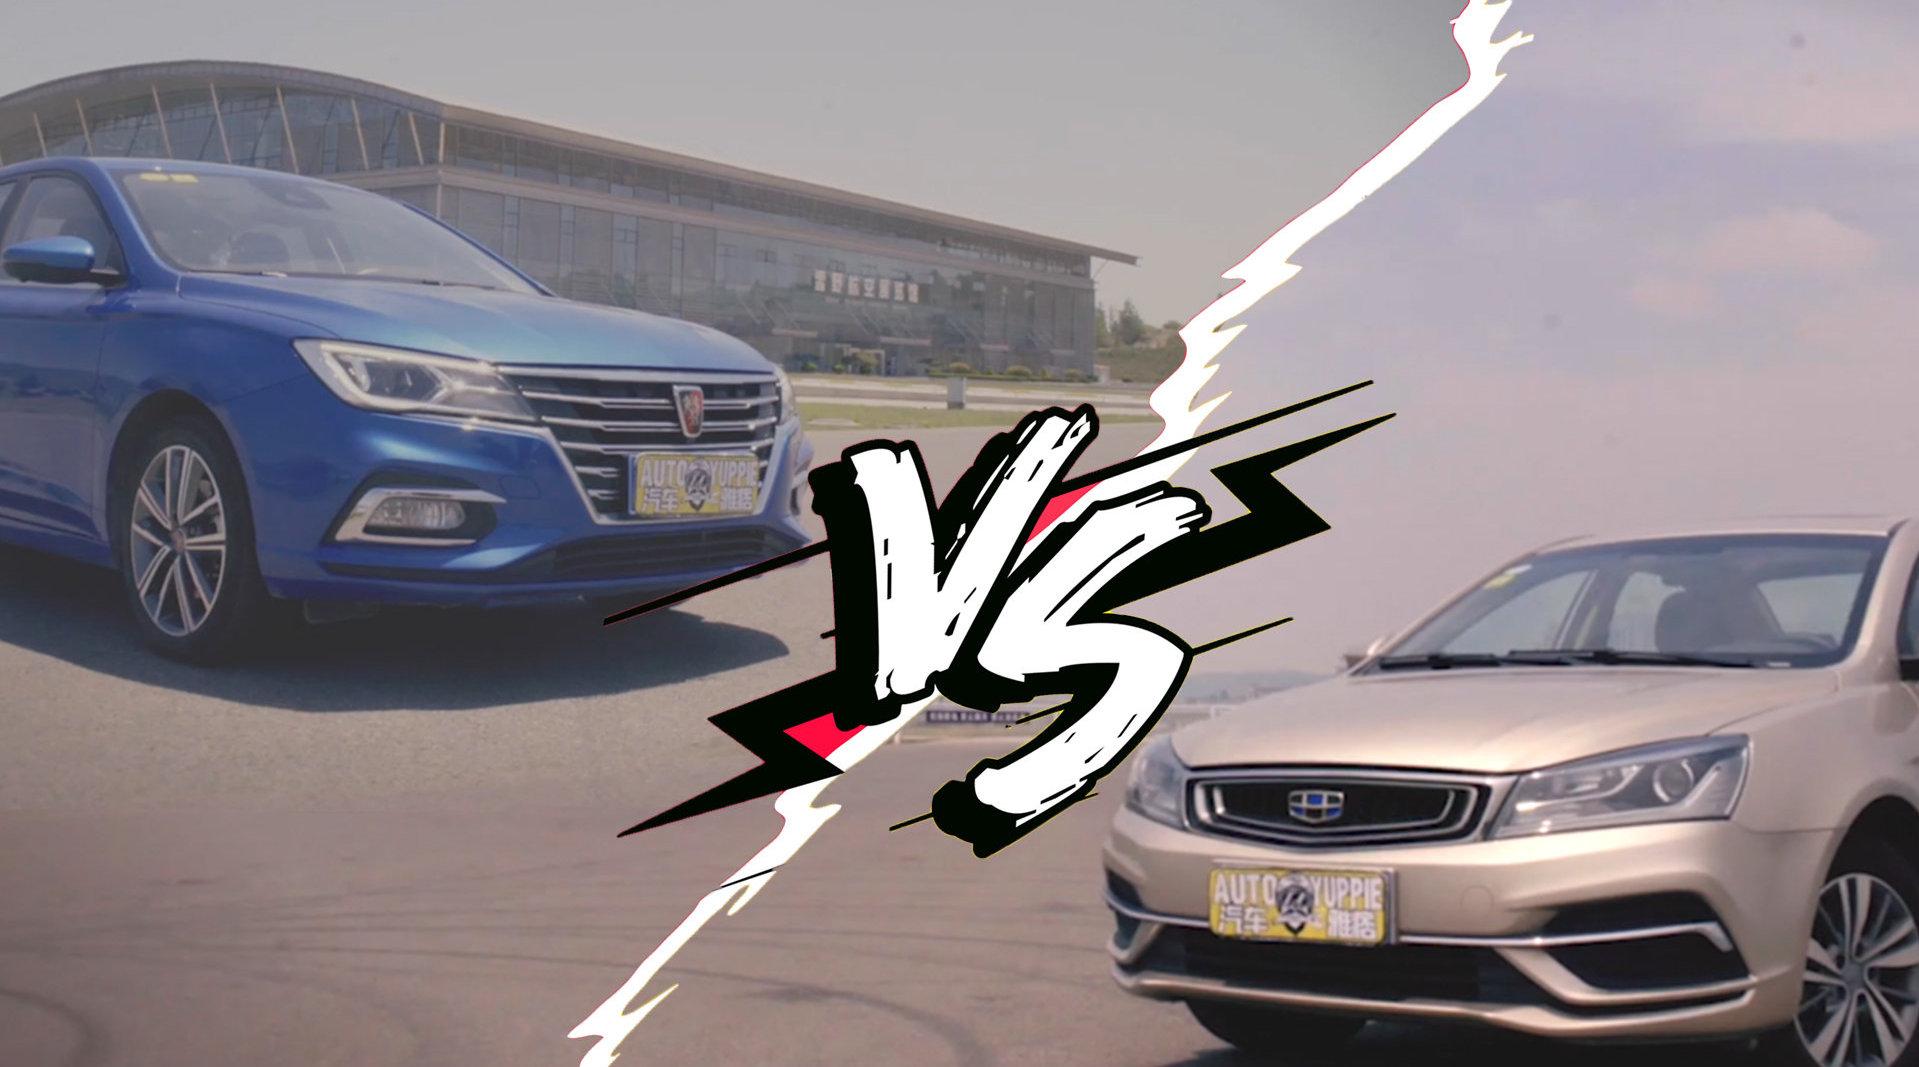 A级轿车一直是汽车市场上竞争最激烈的级别,自主品牌尤甚